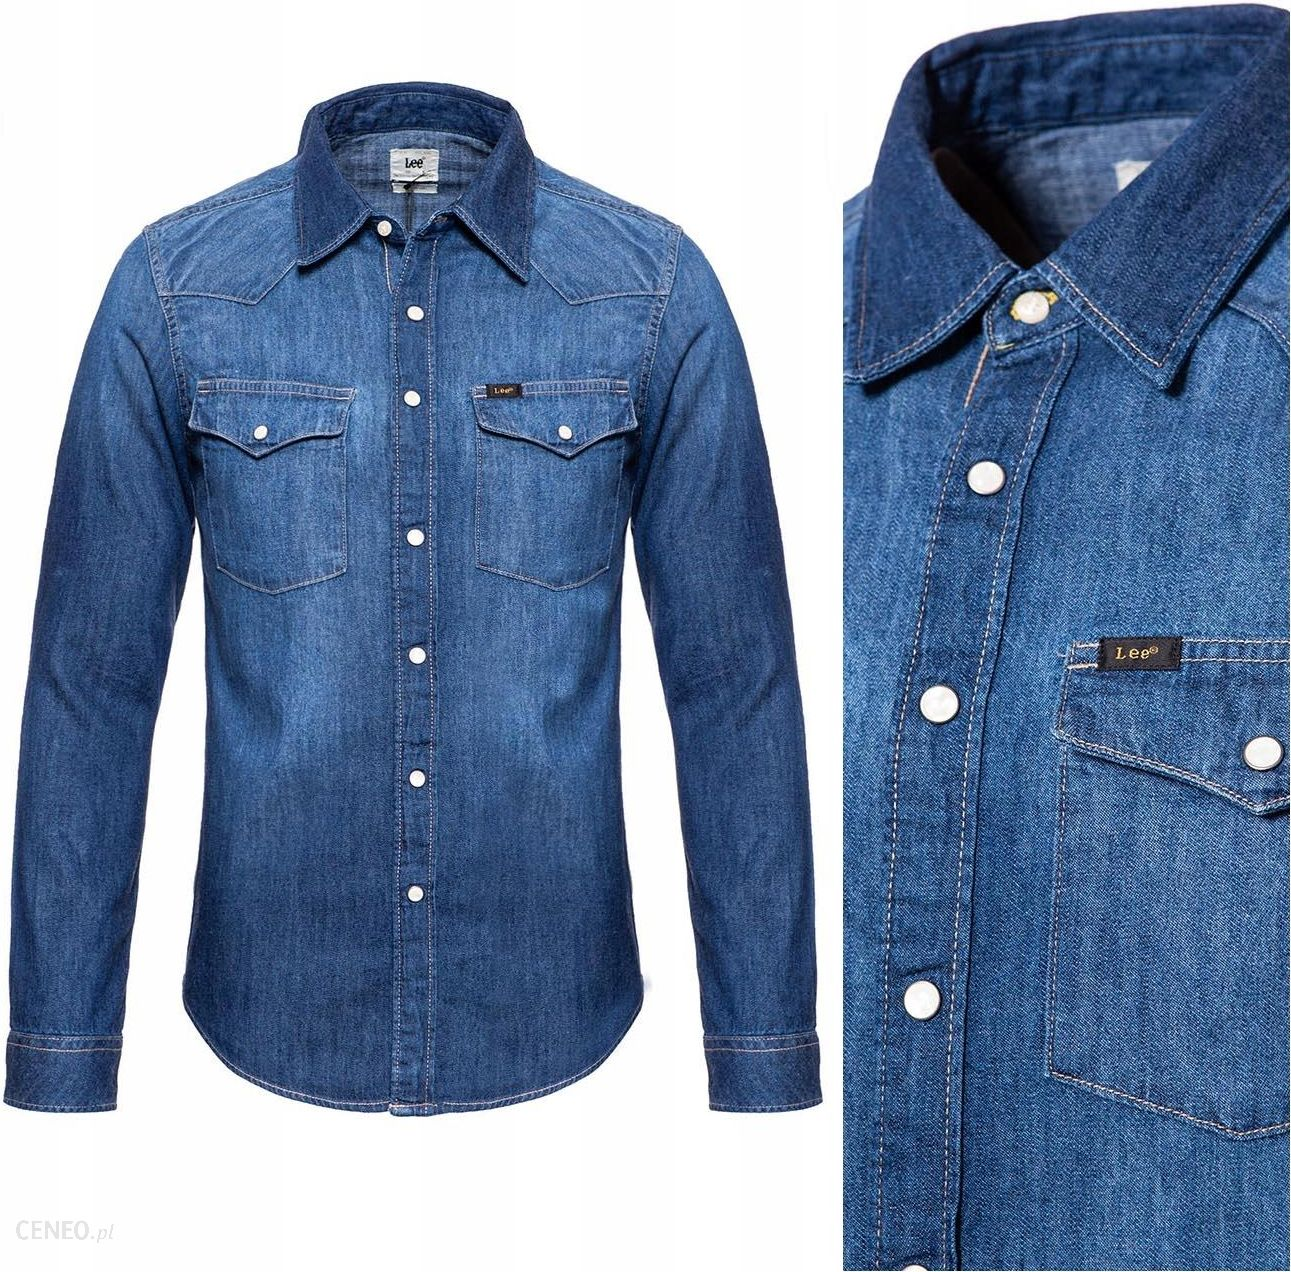 Lee Western Shirt Koszula Męska Jeansowa Slim S Ceny i  vuDzA